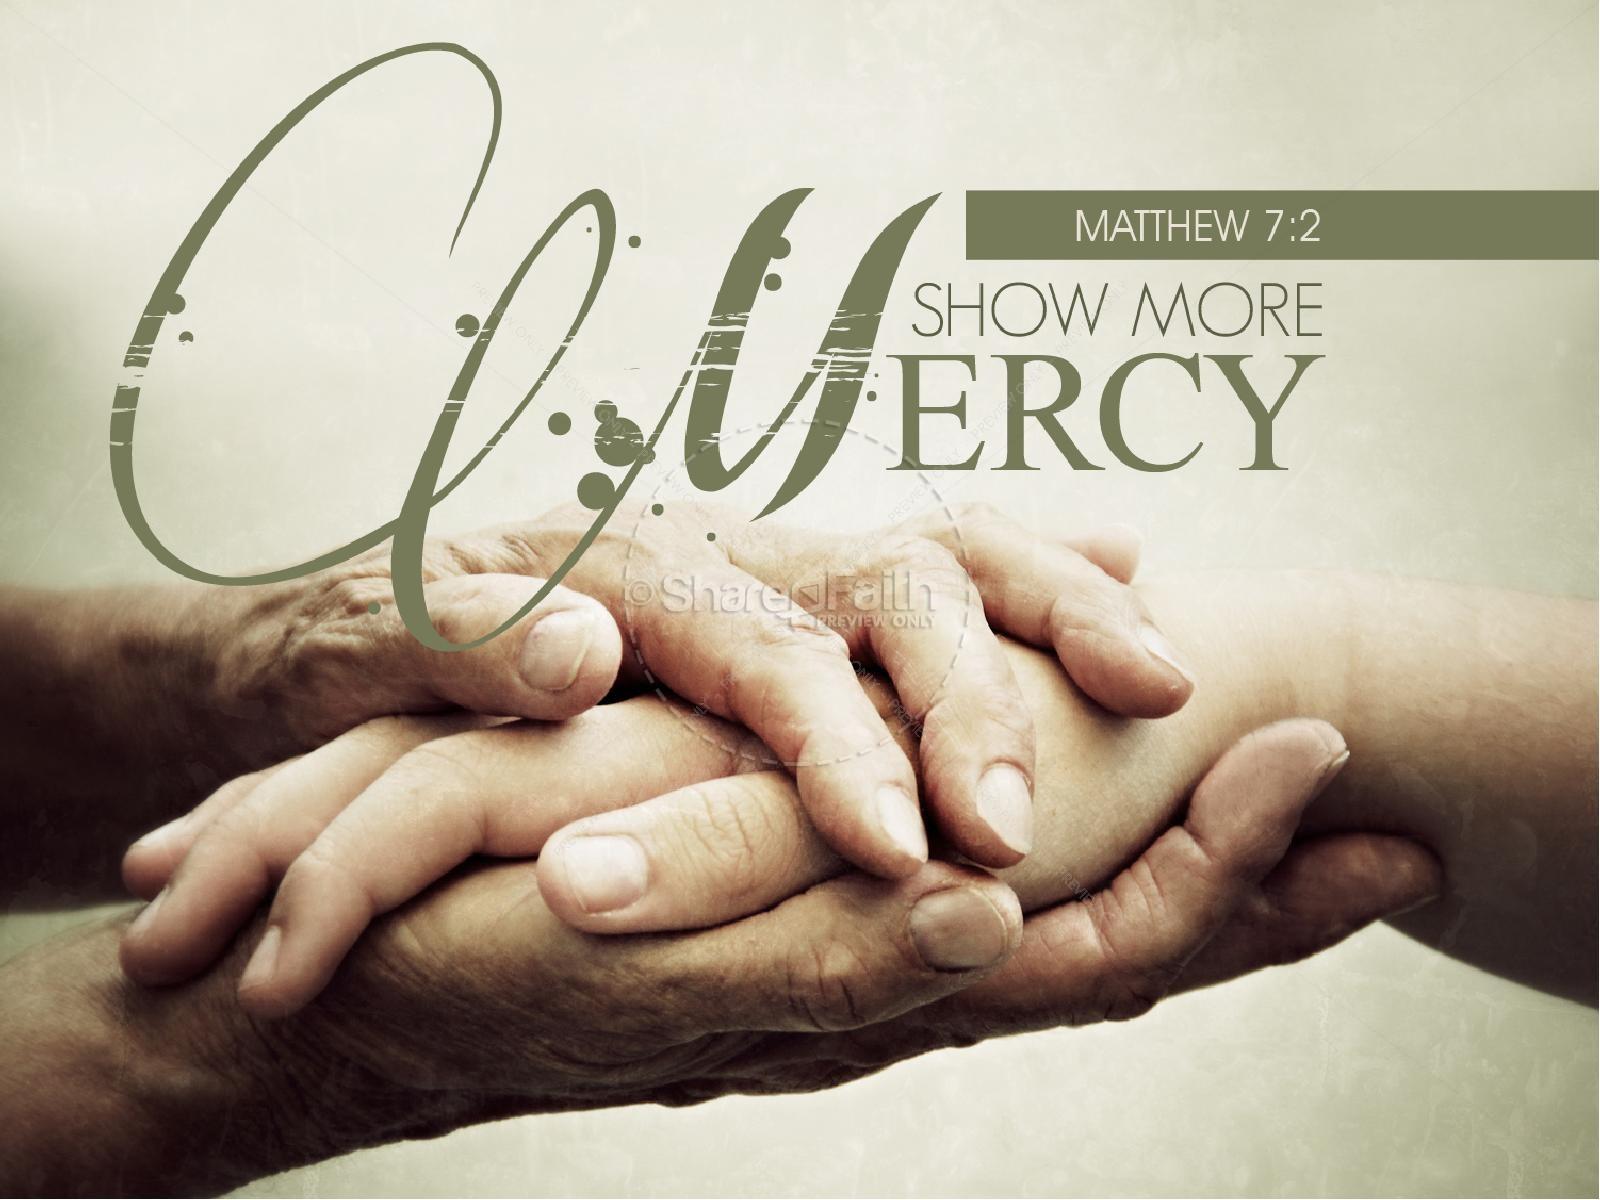 Show mercy powerpoint sermon powerpoint sermons